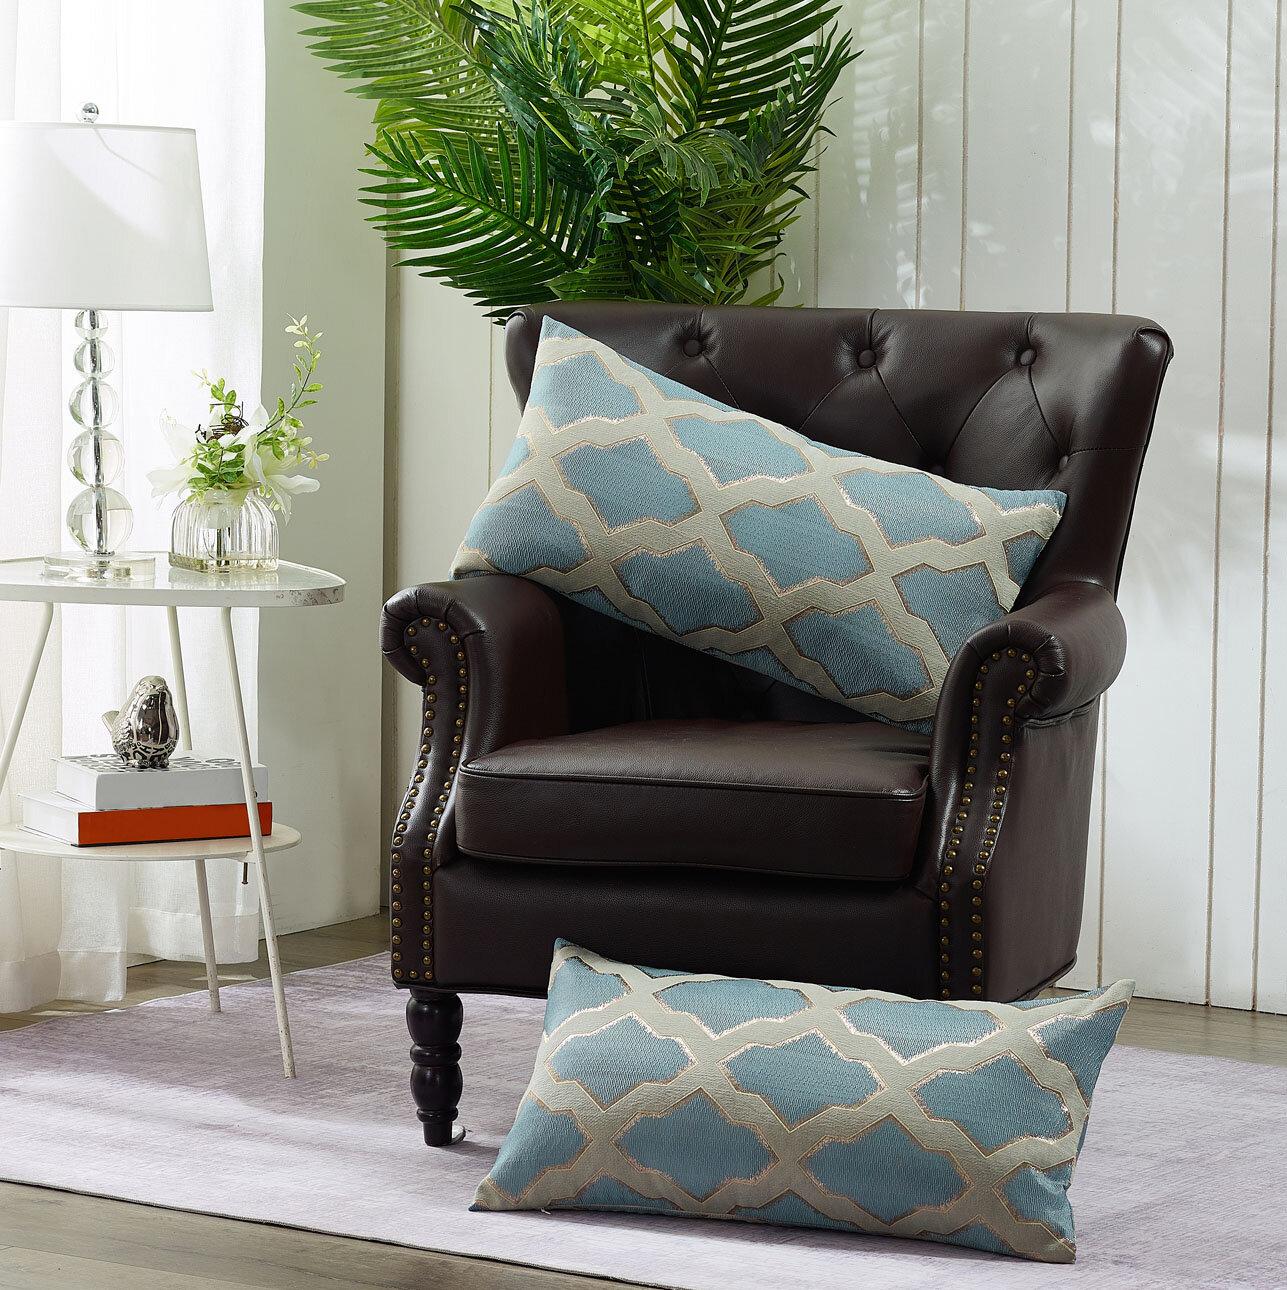 Red Barrel Studio Beedeville Geometric Lumbar Pillow Cover Reviews Wayfair